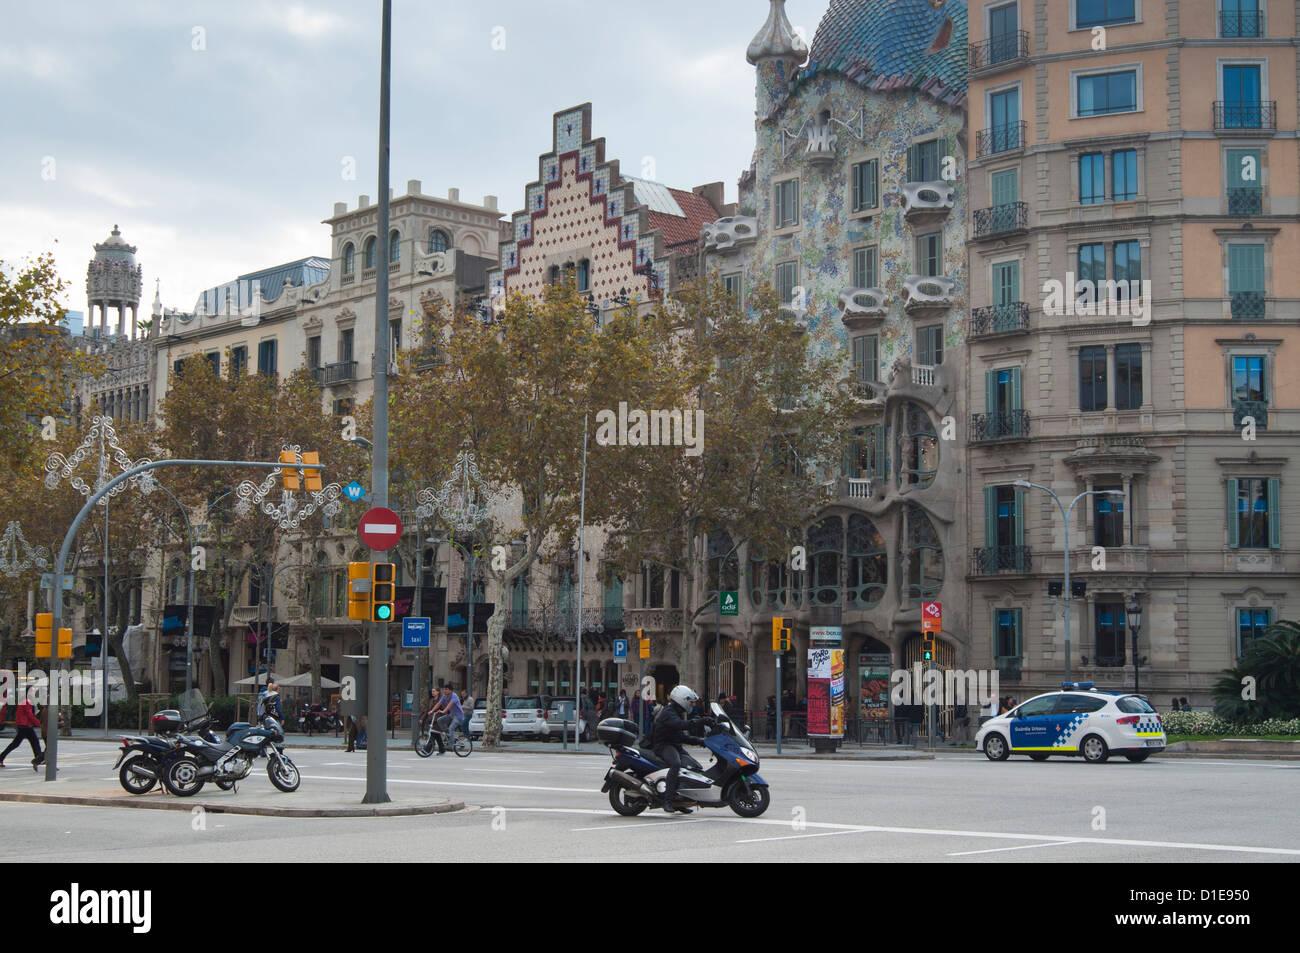 Casa Batllo von Gaudi und Casa Amatler Cadafalch, Barcelona, Catalunya (Katalonien) (Cataluna), Spanien, Europa Stockbild